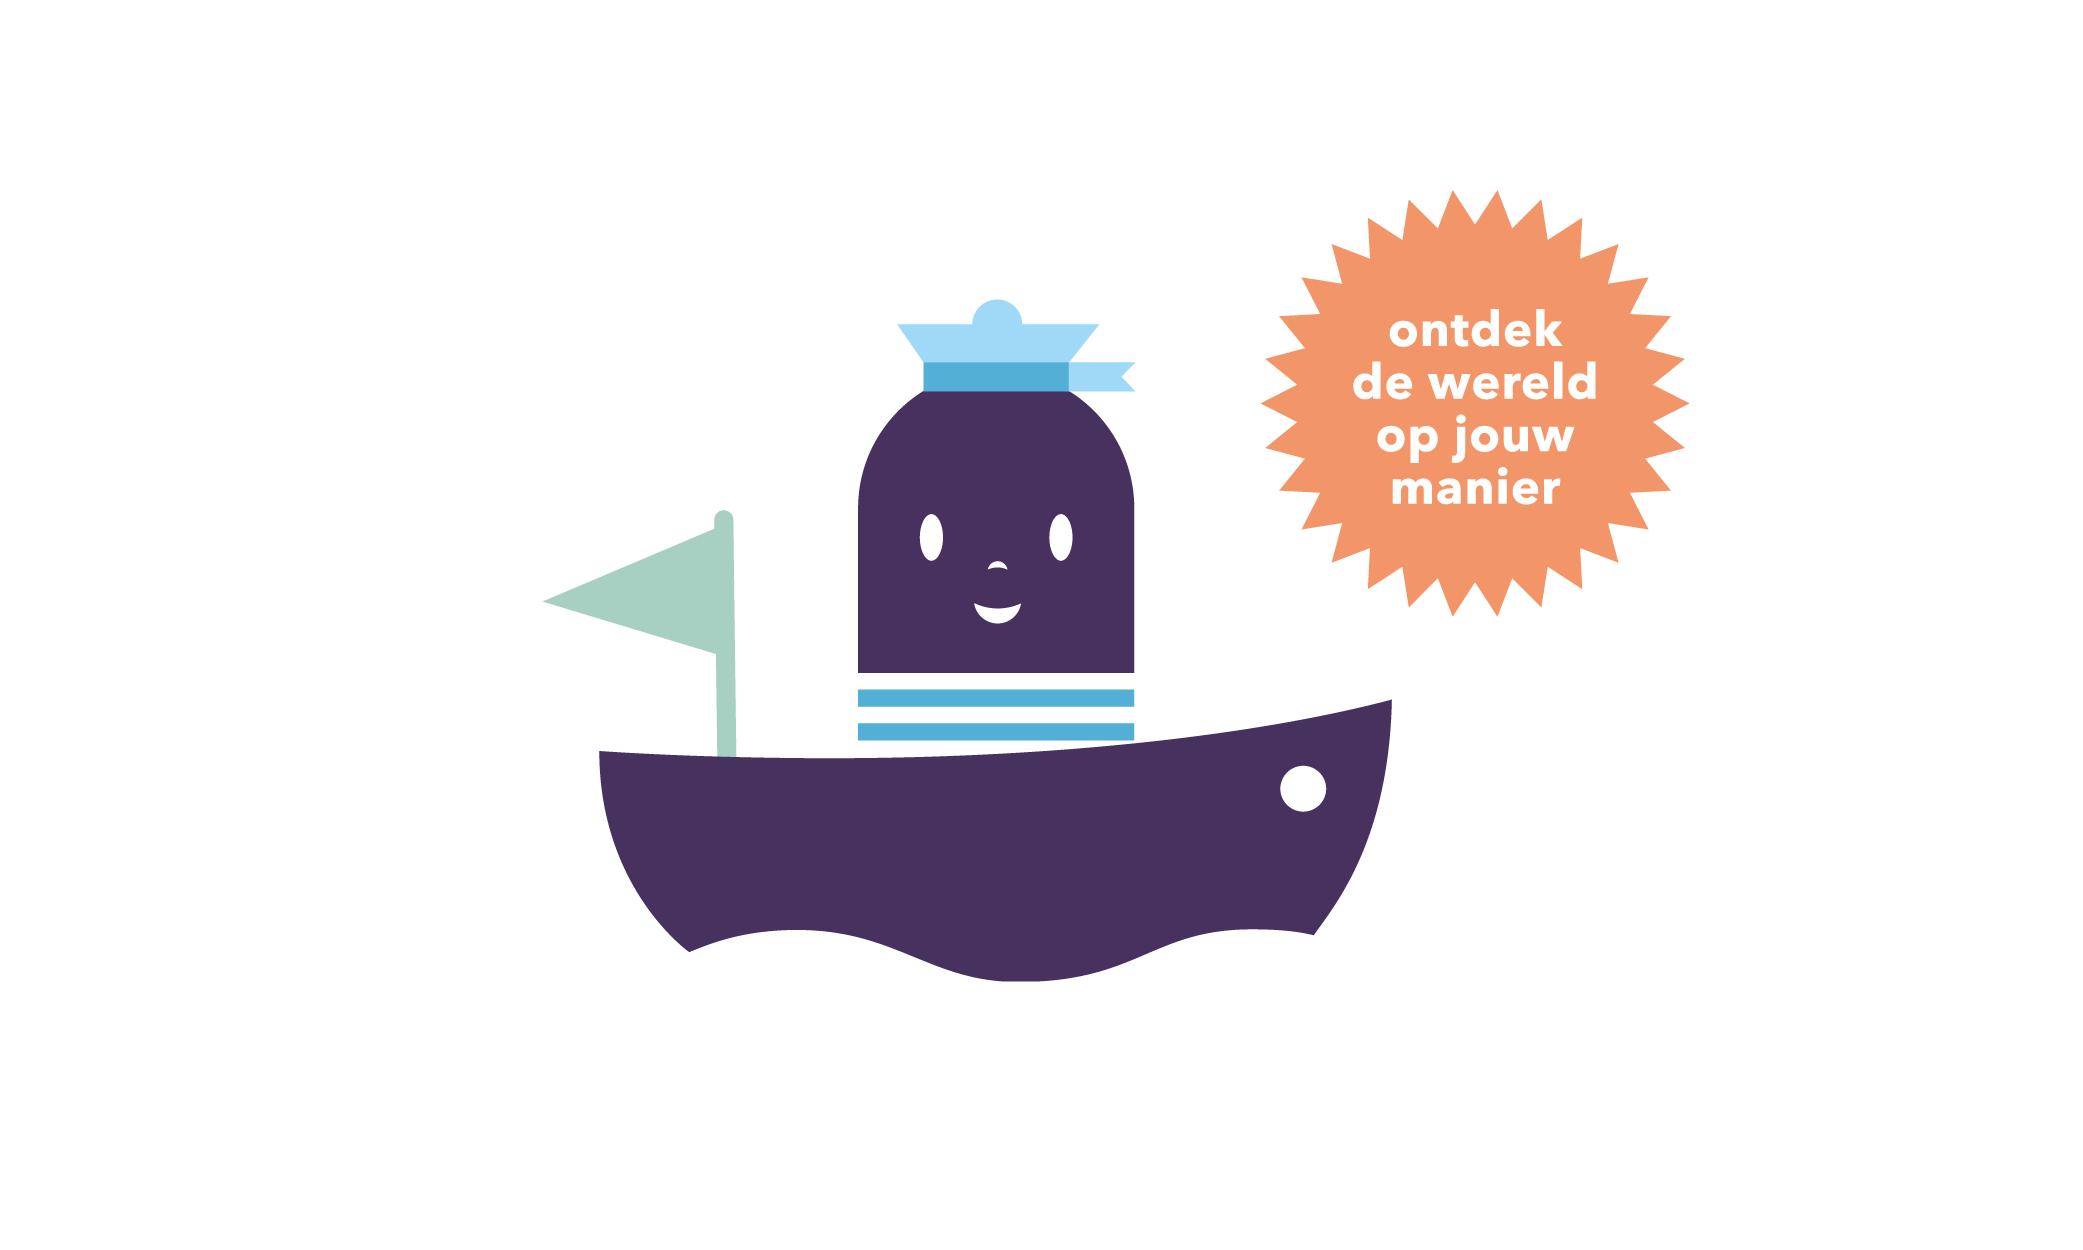 (c) Janprinsschool.nl